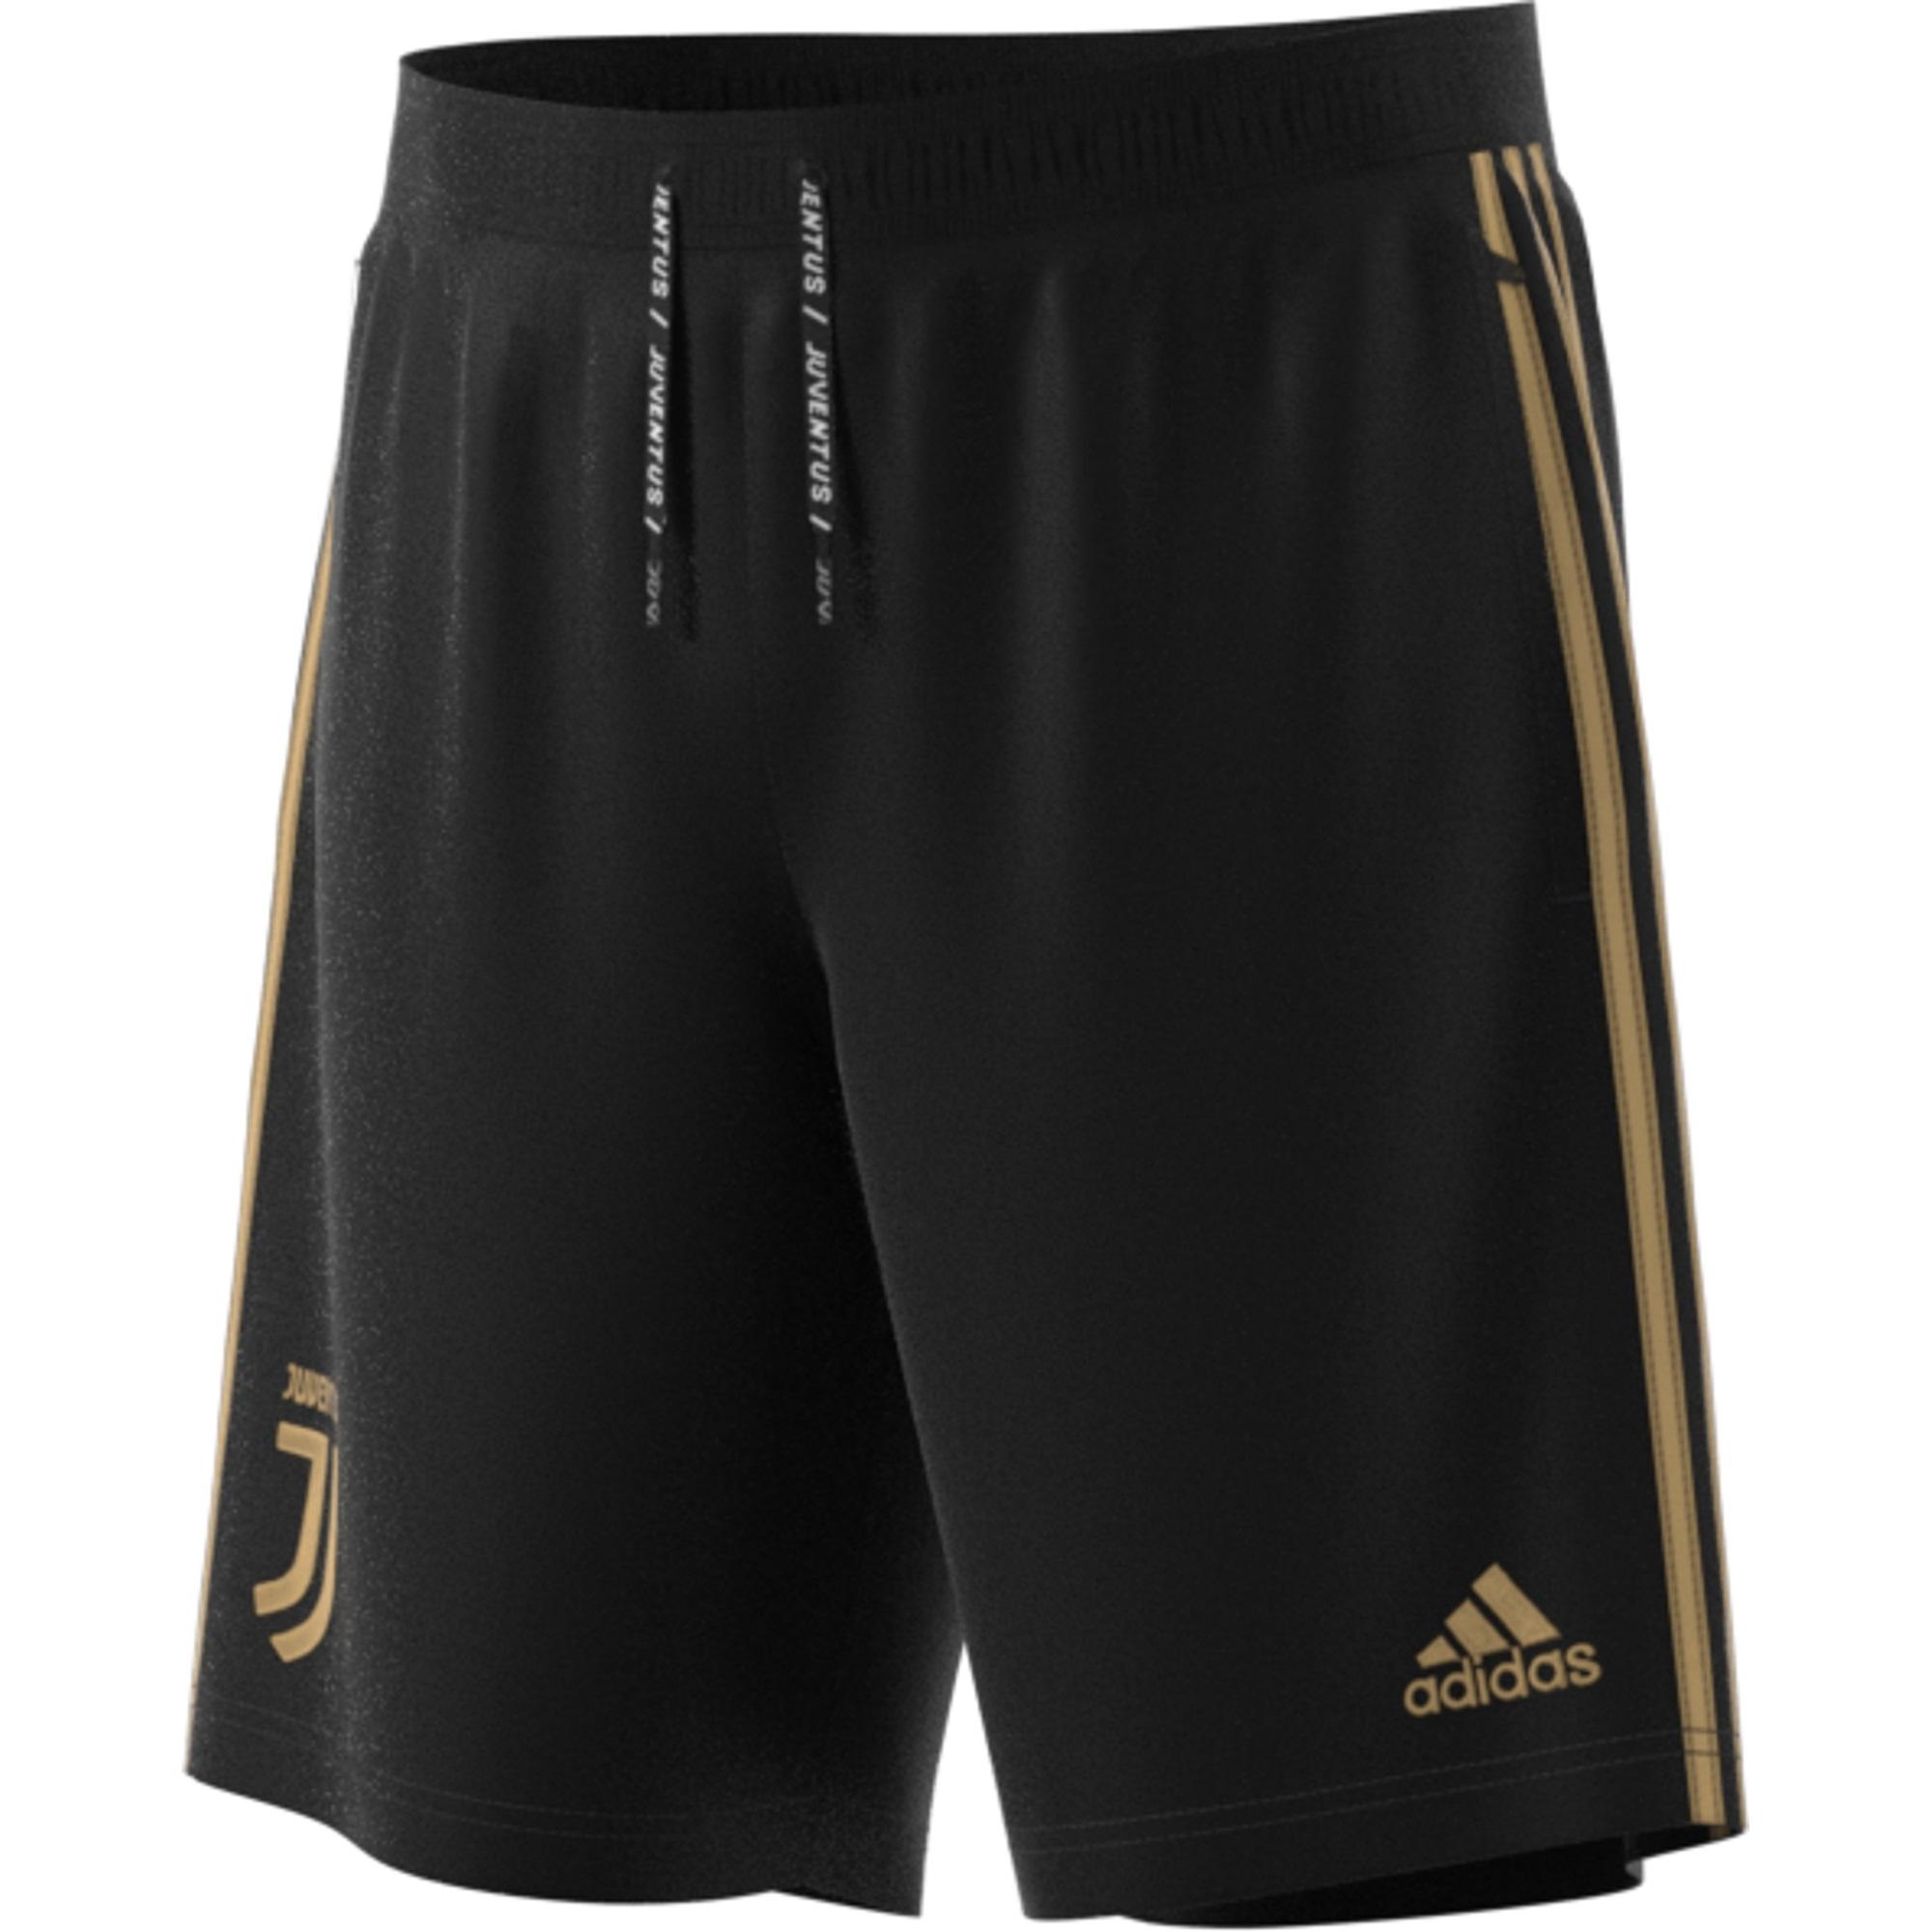 pantaloni adidas nero oro